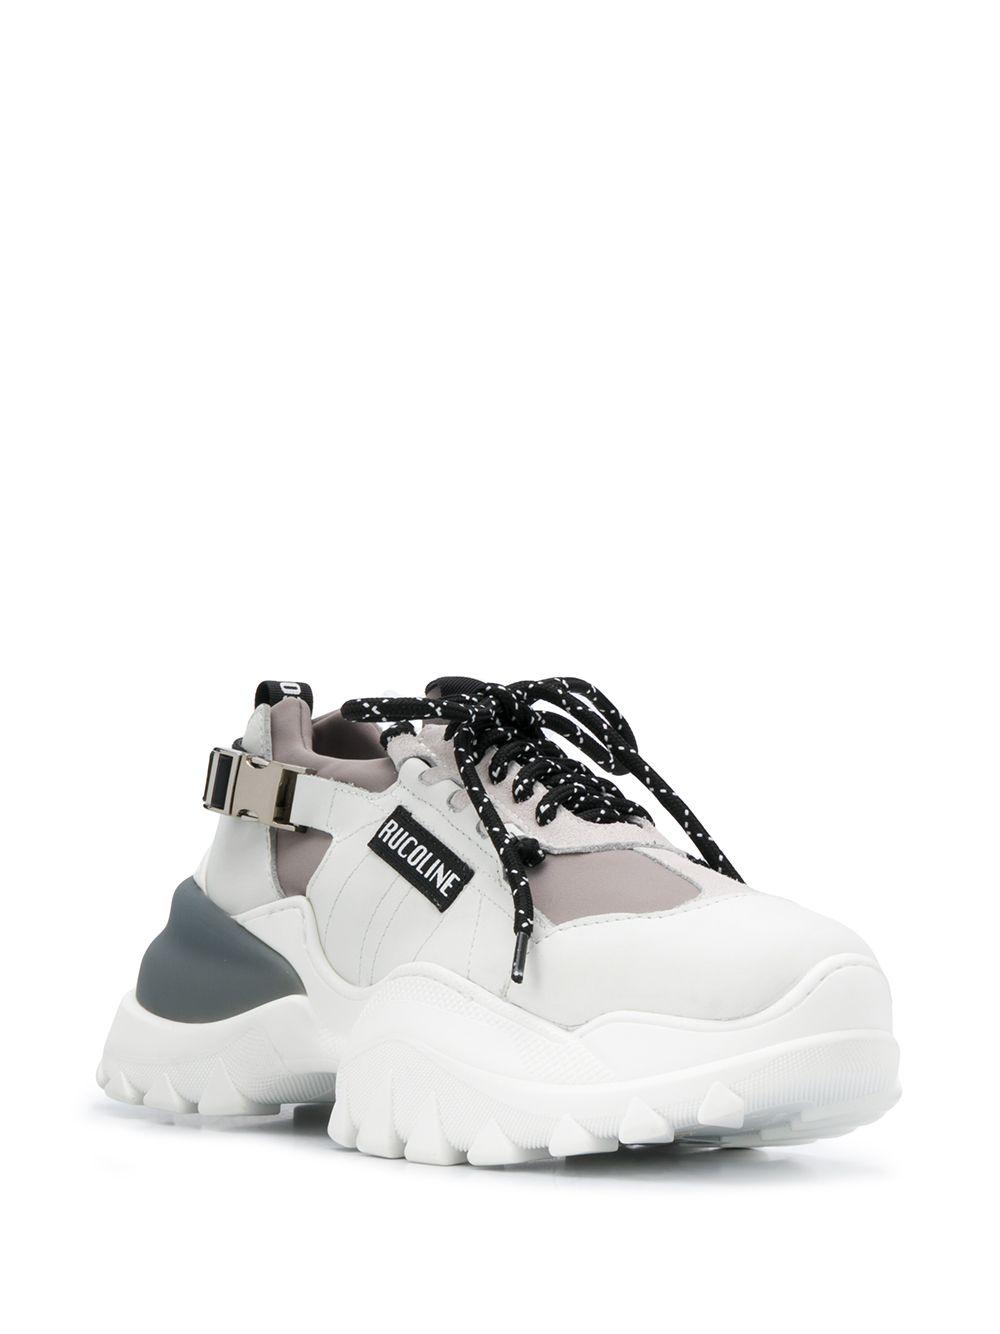 Rucoline R Start 930 Sport Lycra Sneakers Farfetch Sneakers Lycra Calf Leather